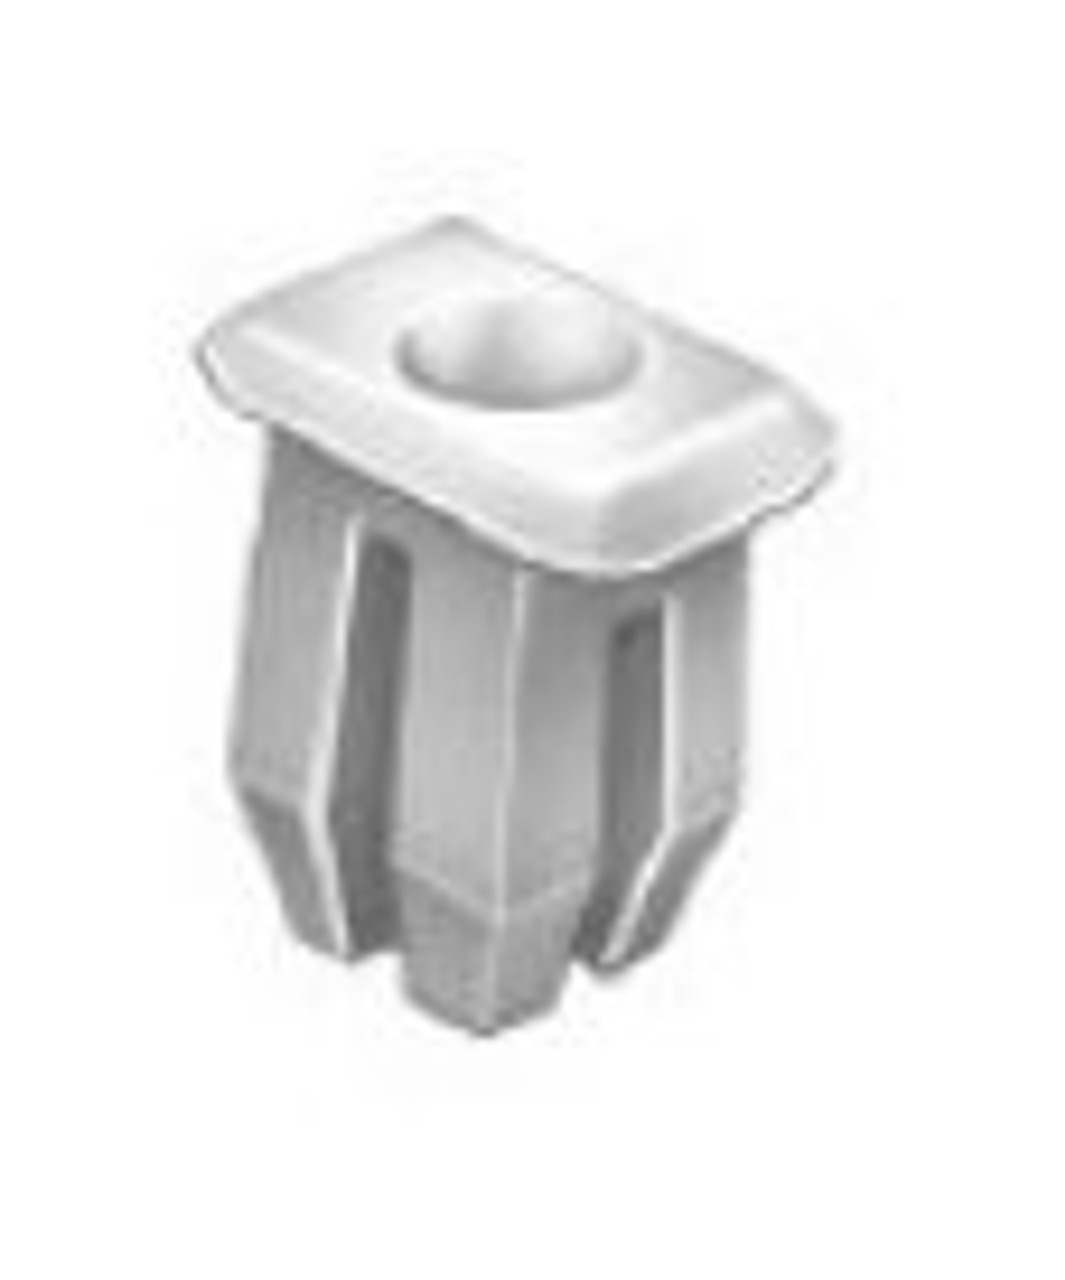 "Nylon Nut Screw Size: #6 Panel Range: .060"" - .150"" GM 1977-On OEM# 1254815 Natural Nylon 50 Per Box Click Next Image For Clip Detail"